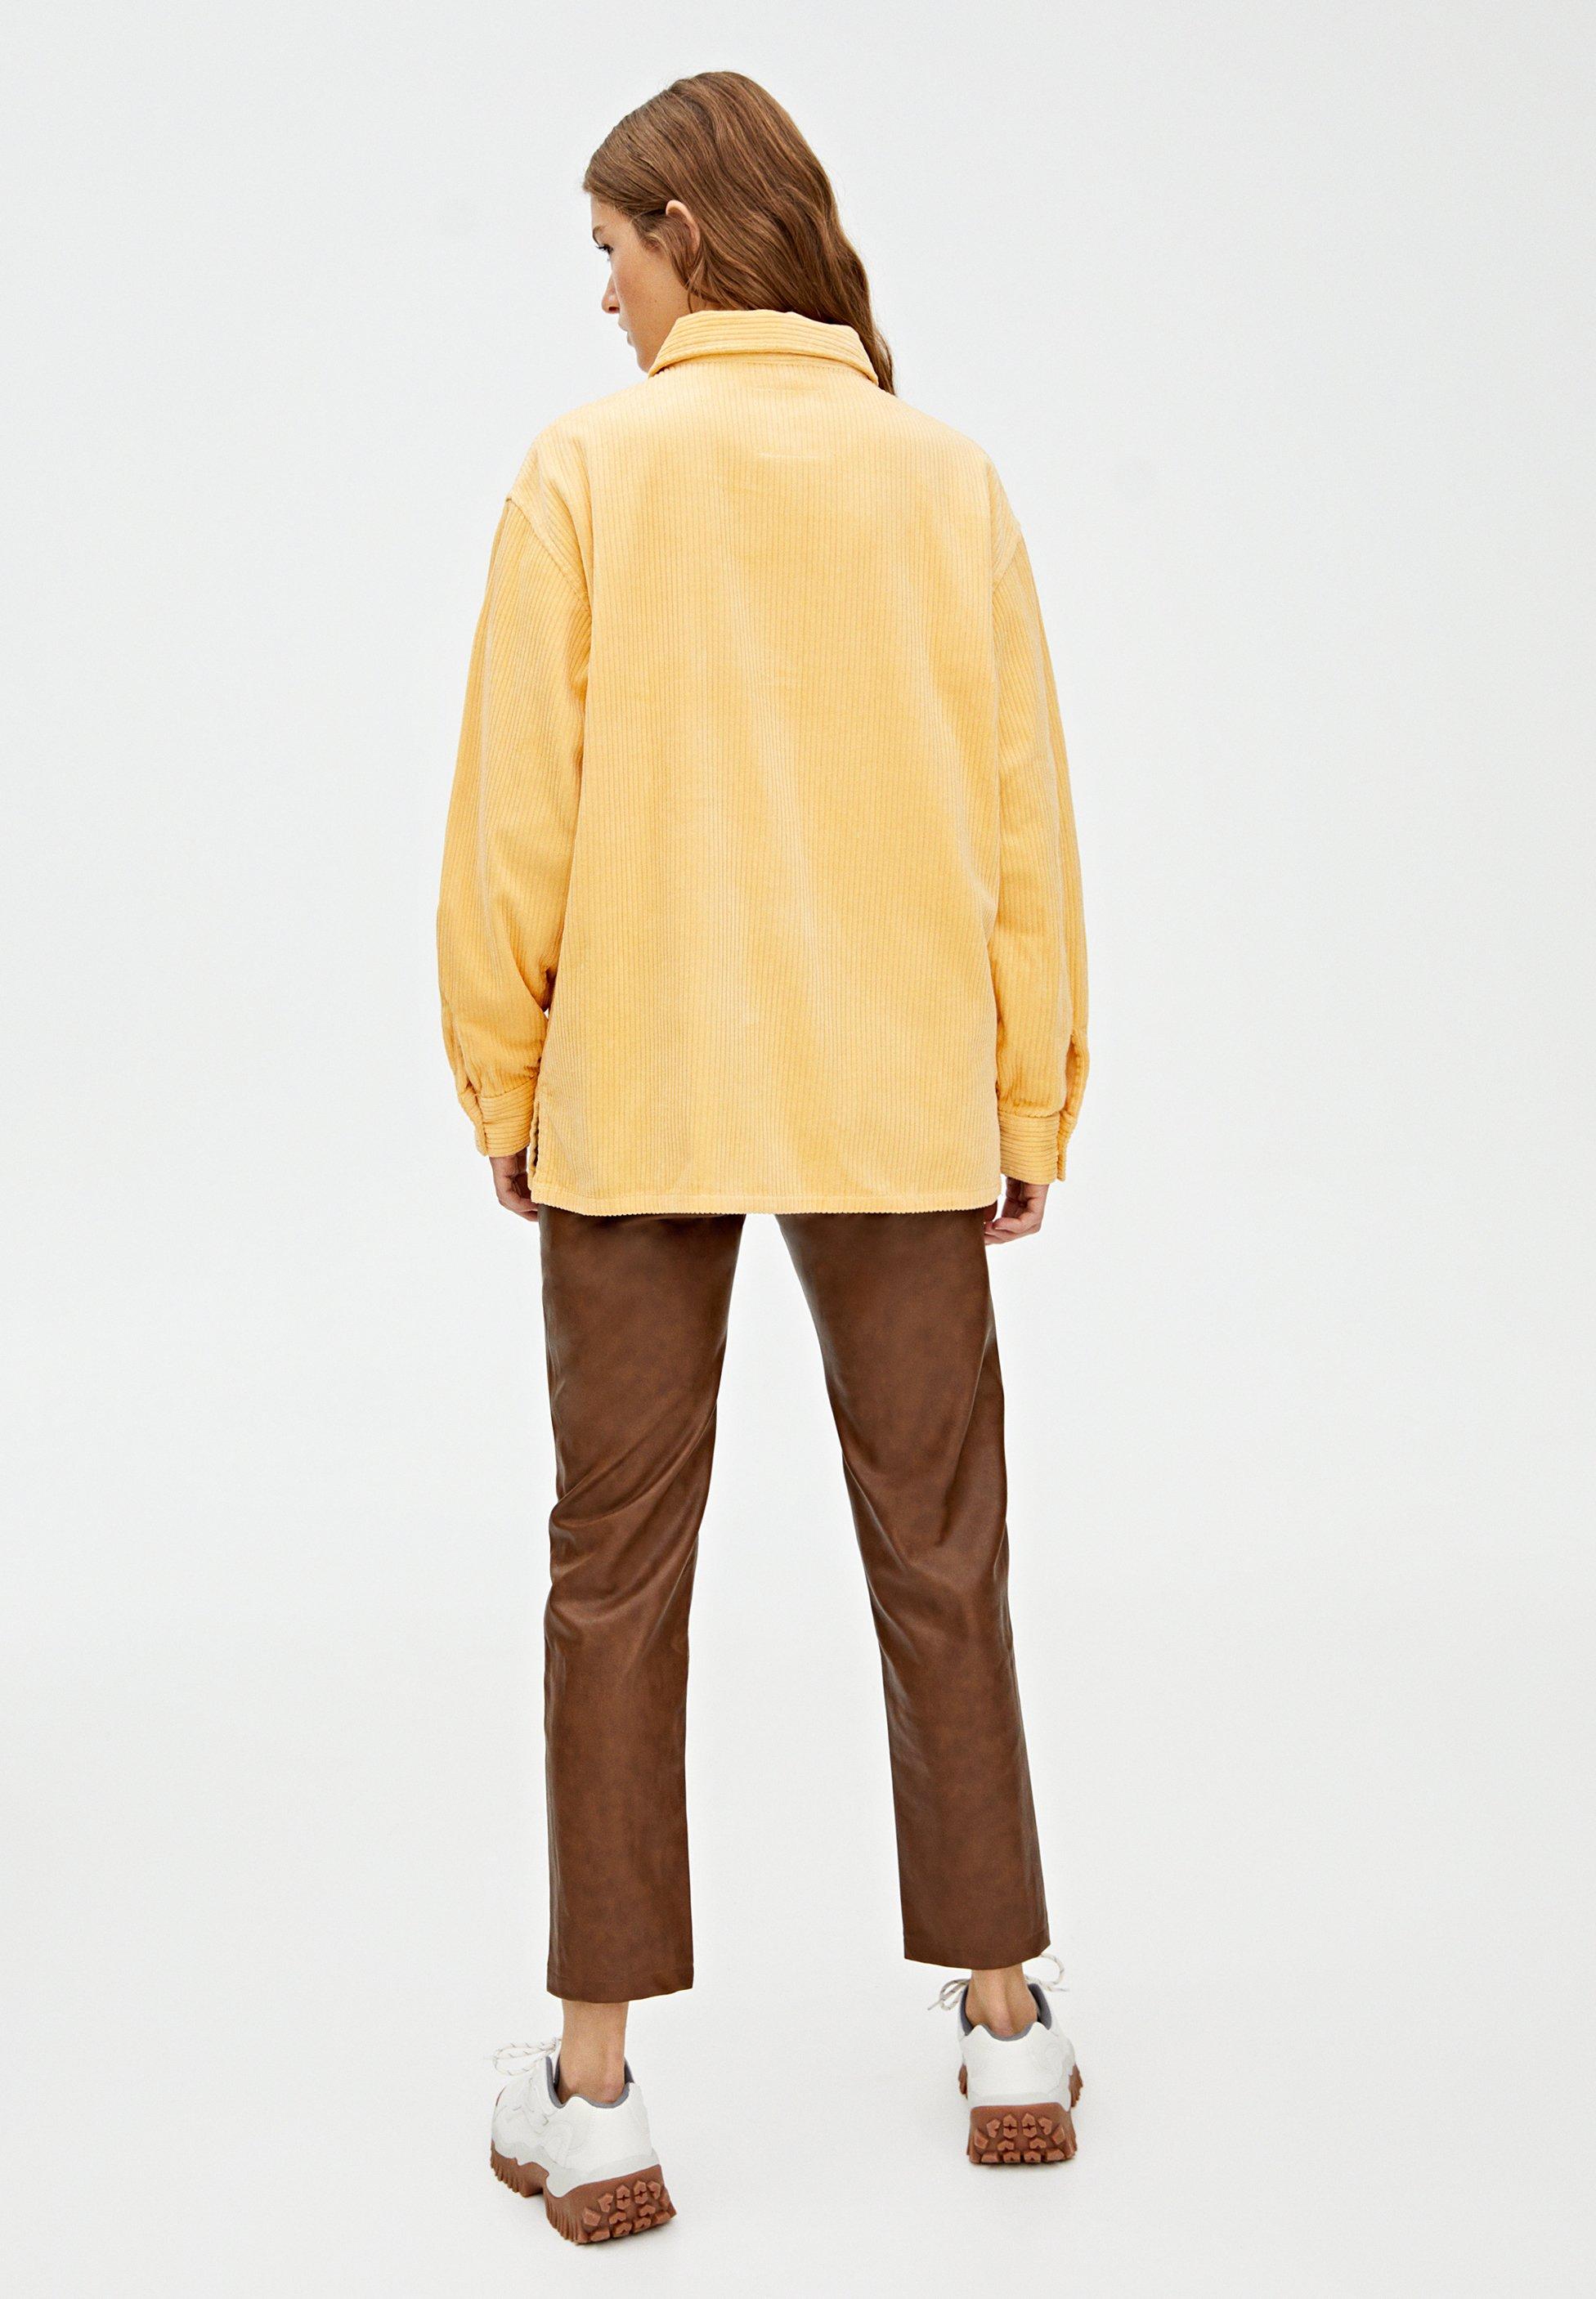 amp;bear amp;bear Yellow Pull Camicia Camicia Pull eCdoxB